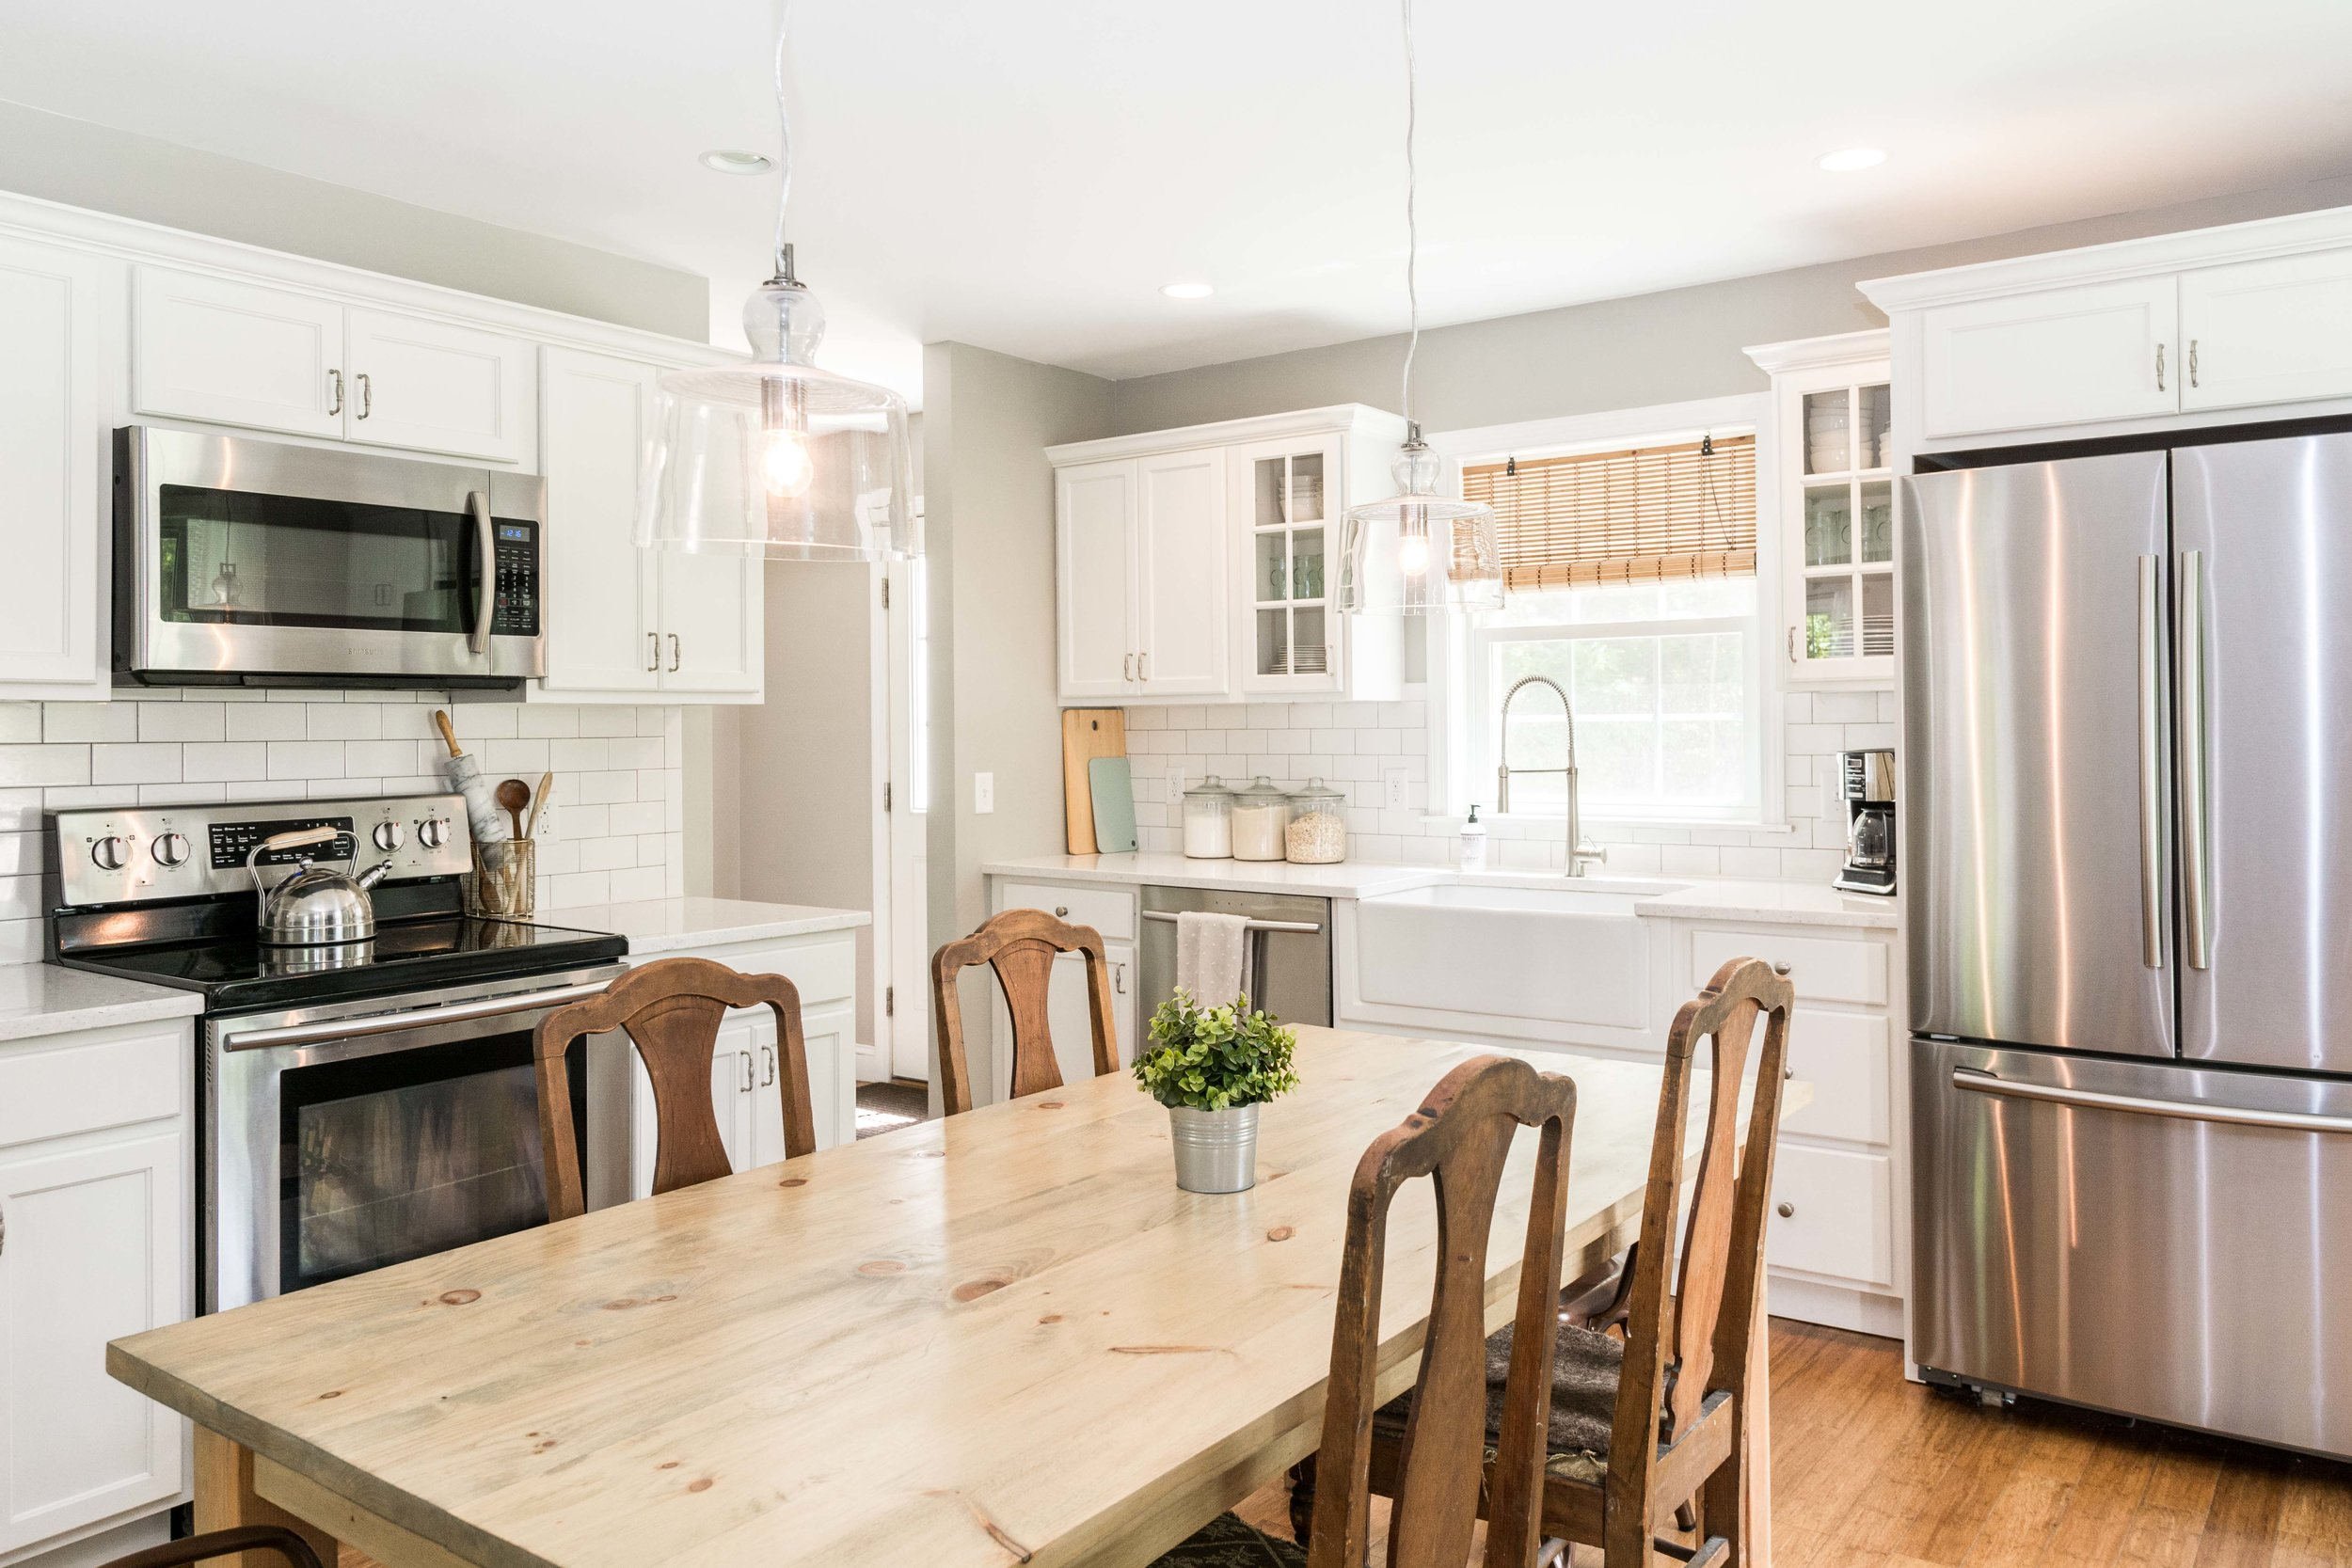 Autumn Lane Starter Home Colonial, Raymond Maine, Kitchen Farmers Sink